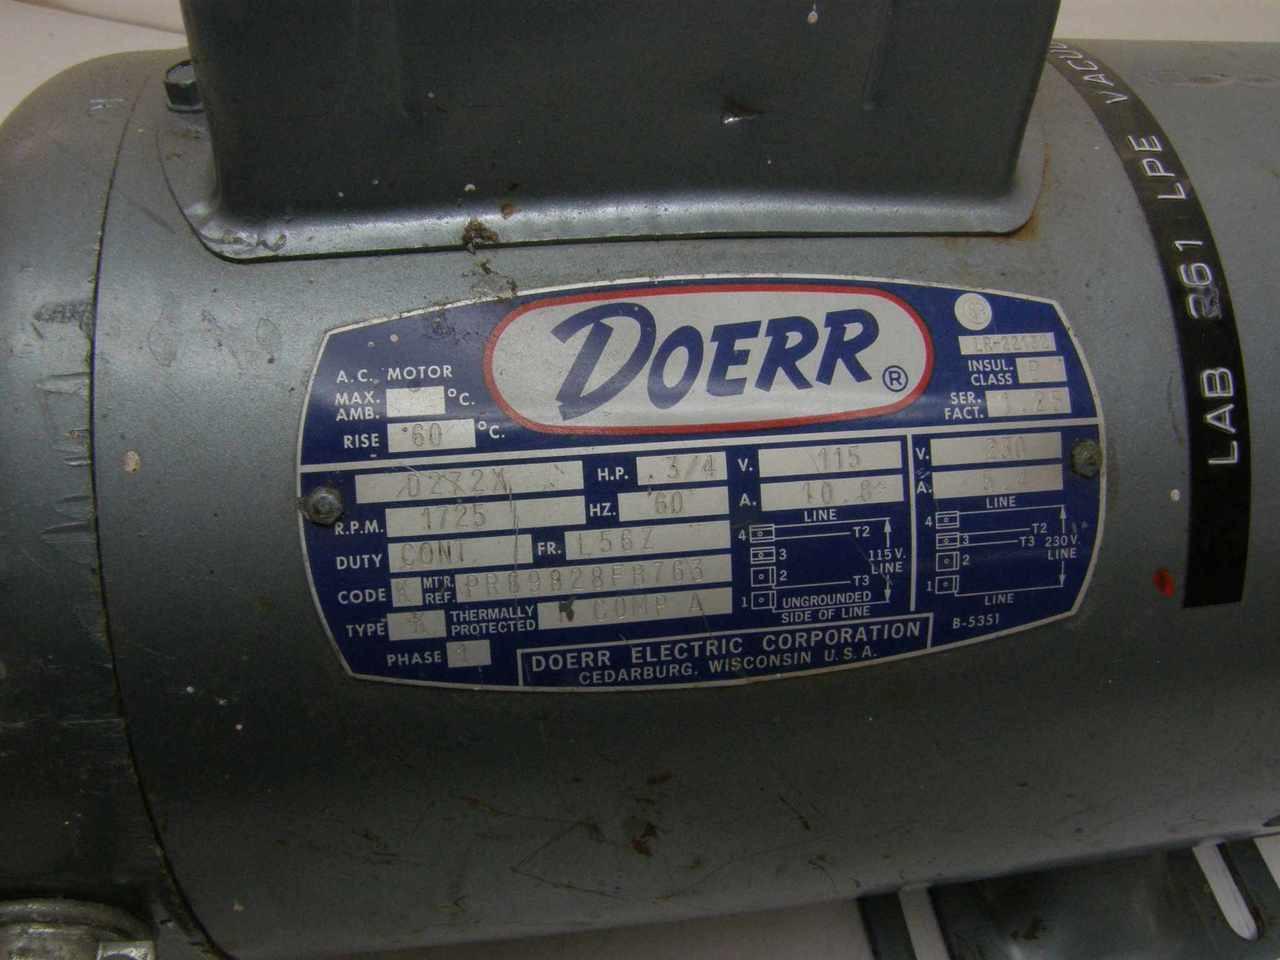 Gast 1022 V103 0272x Oil Less Vacuum Pumpdoerr Motor D272x Oilless Pump Wire Diagram